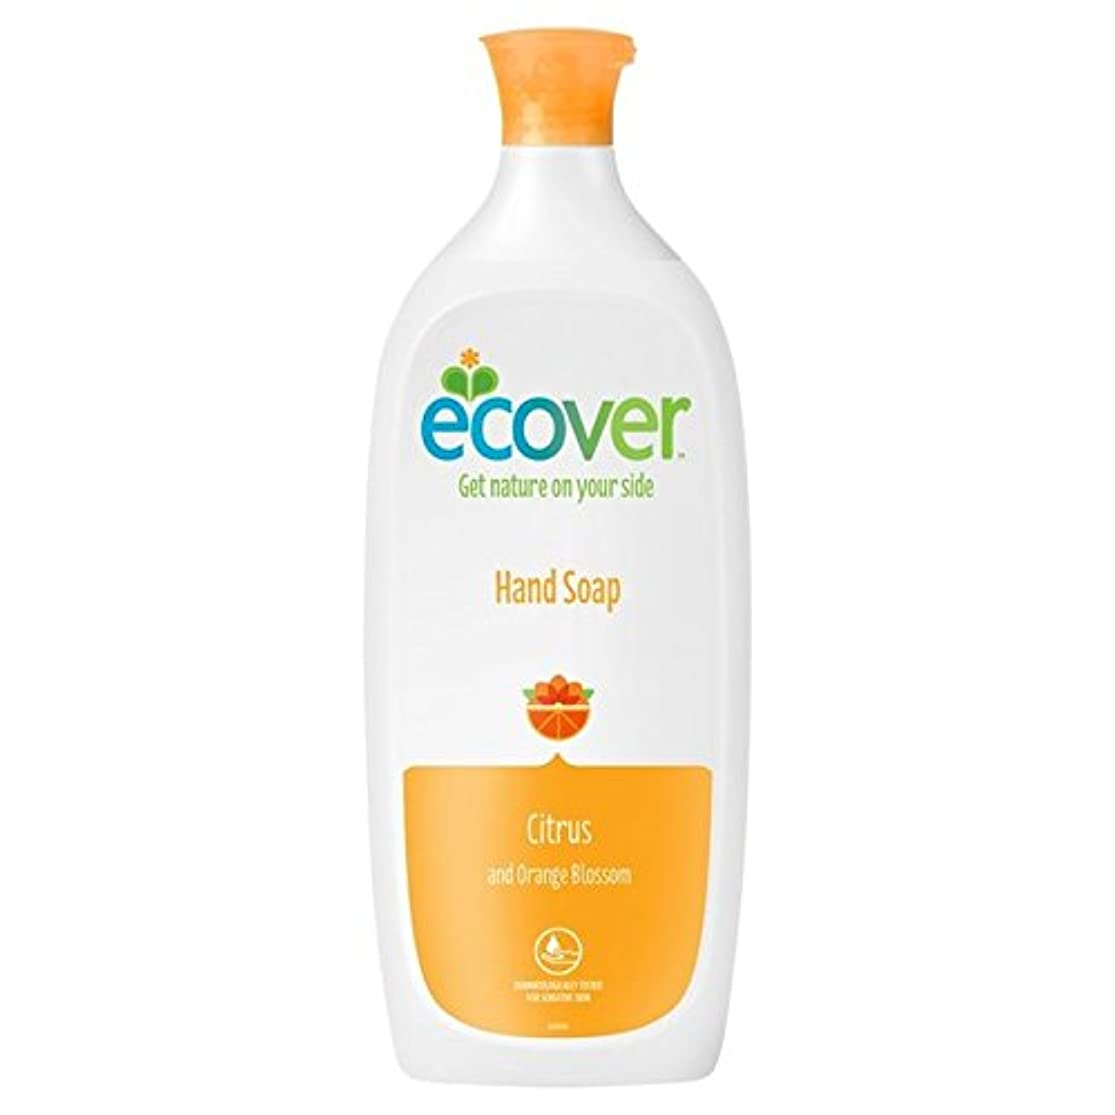 Ecover Liquid Soap Citrus & Orange Blossom Refill 1L - エコベール液体石鹸シトラス&オレンジの花のリフィル1リットル [並行輸入品]